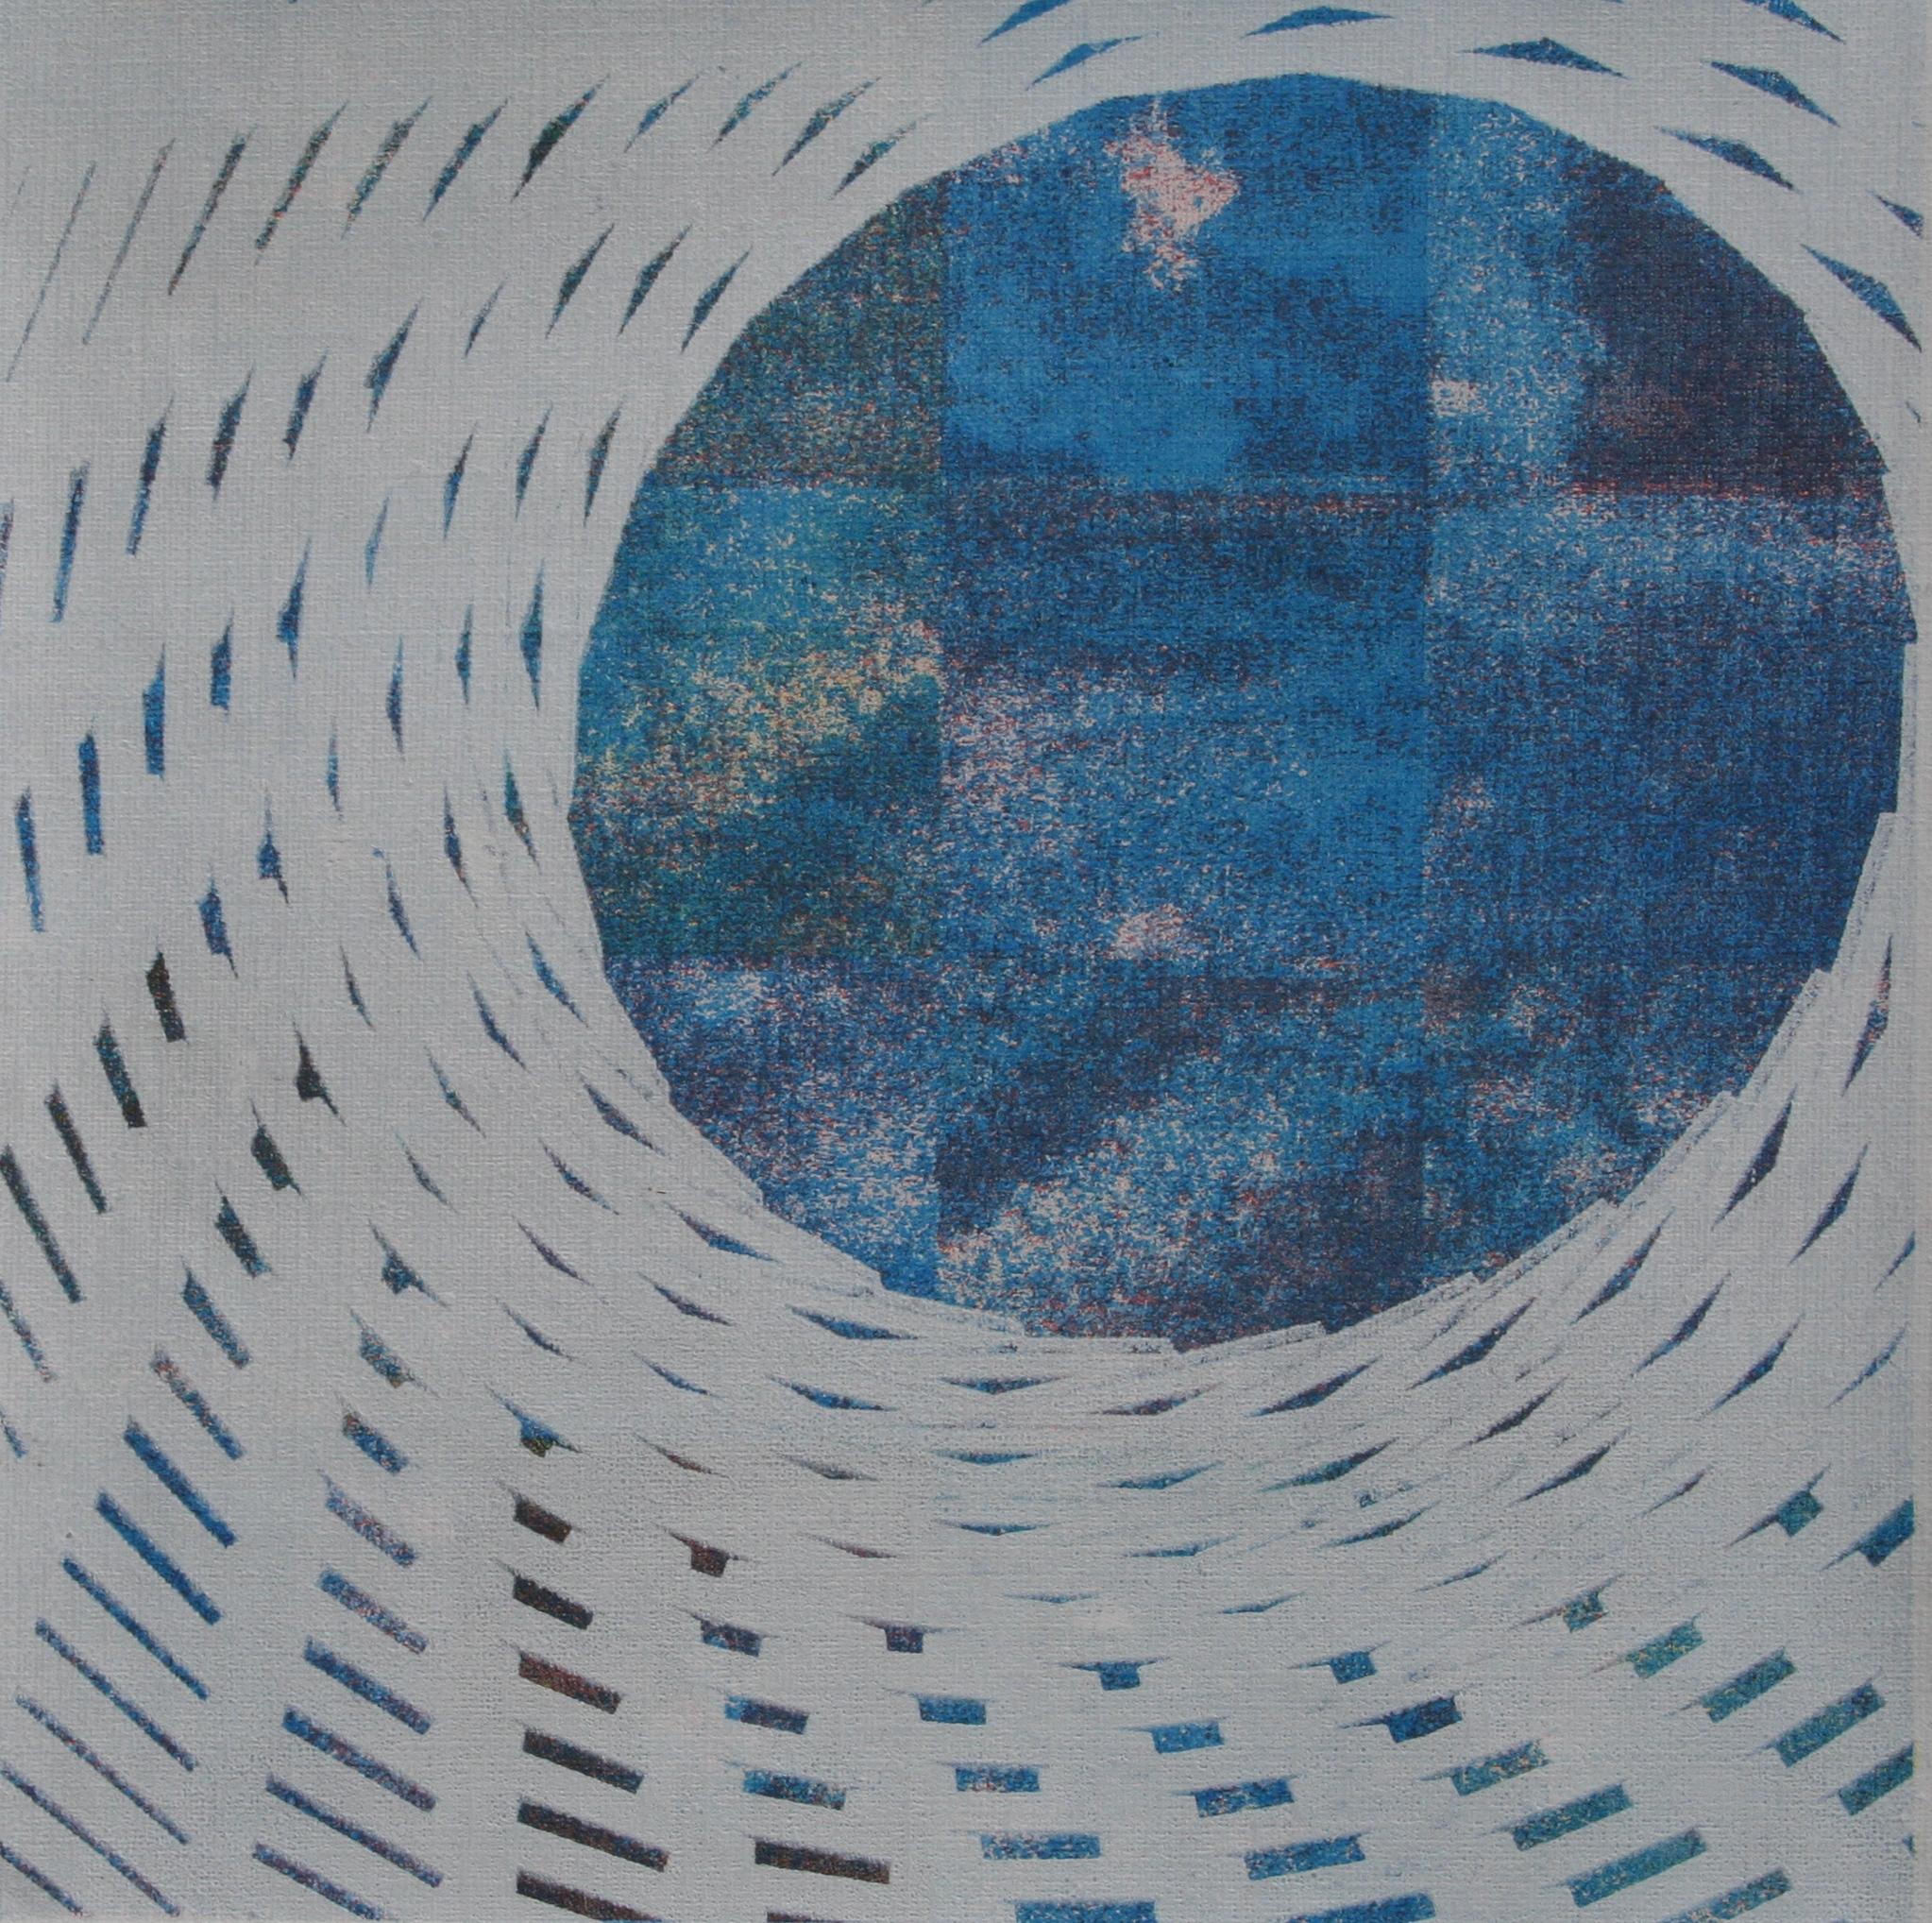 Avondcirkel zeefdruk op linnen 20 x 20